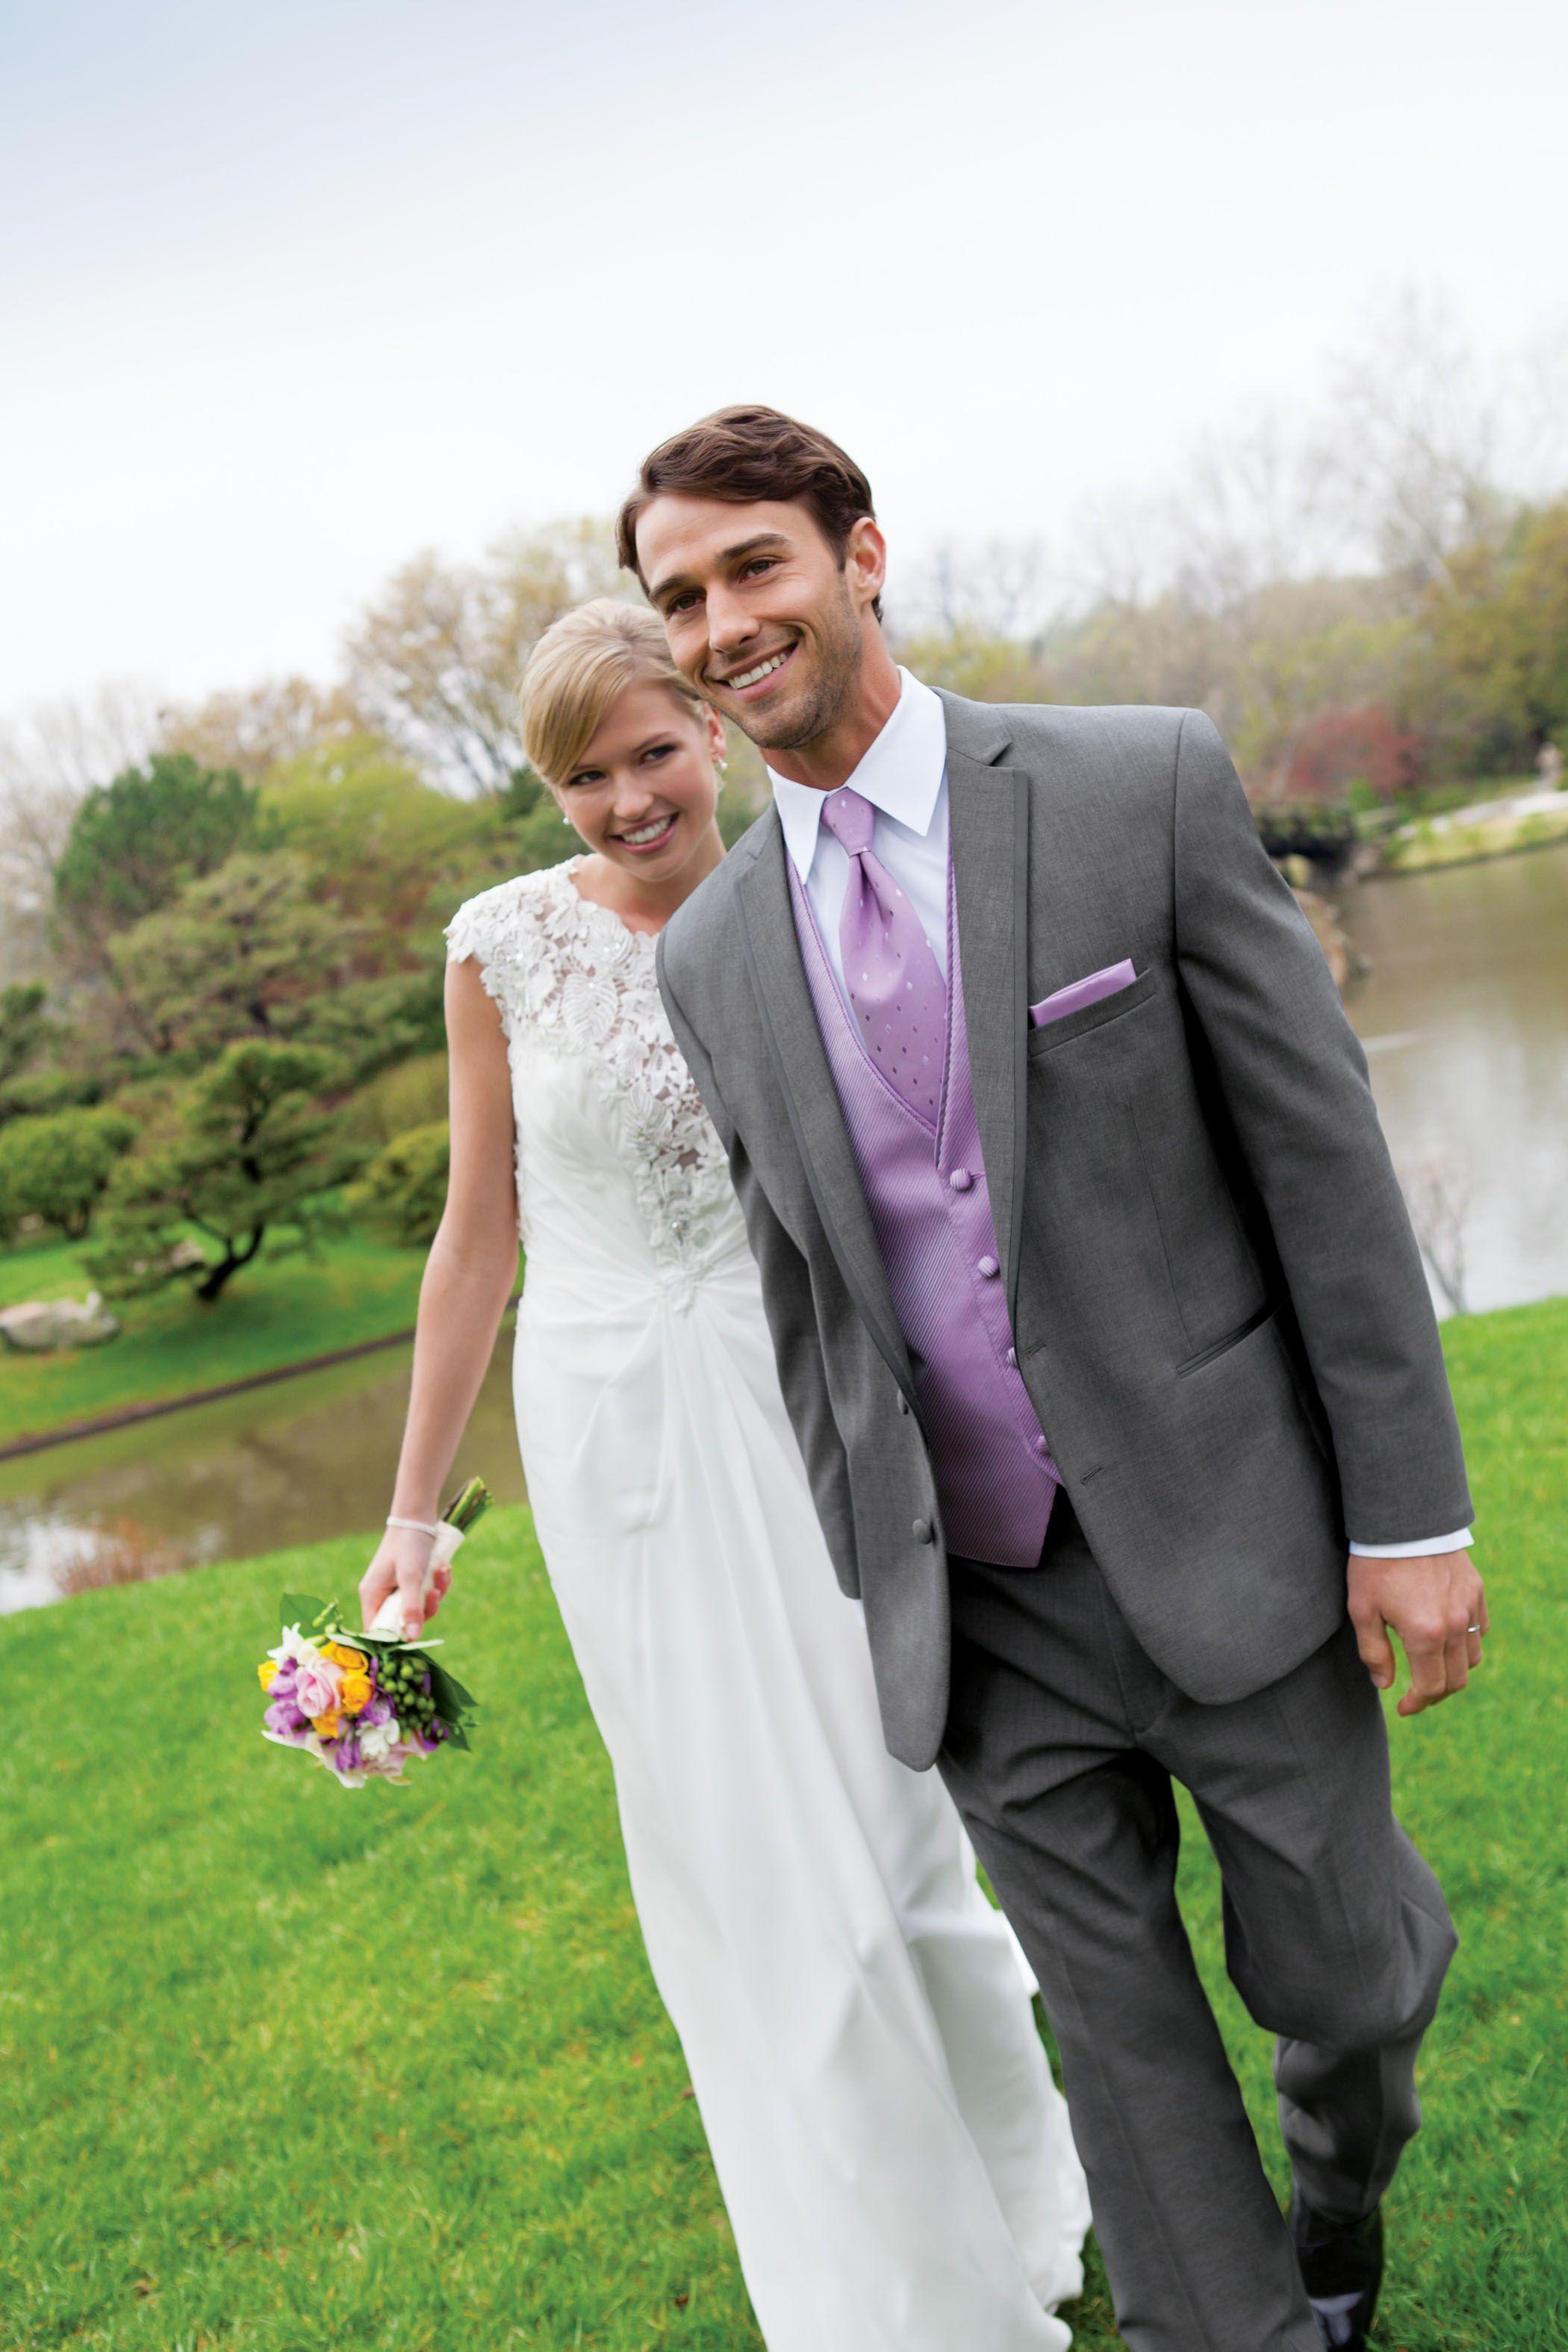 Absolutely fitting orlando tuxedo wedding spring